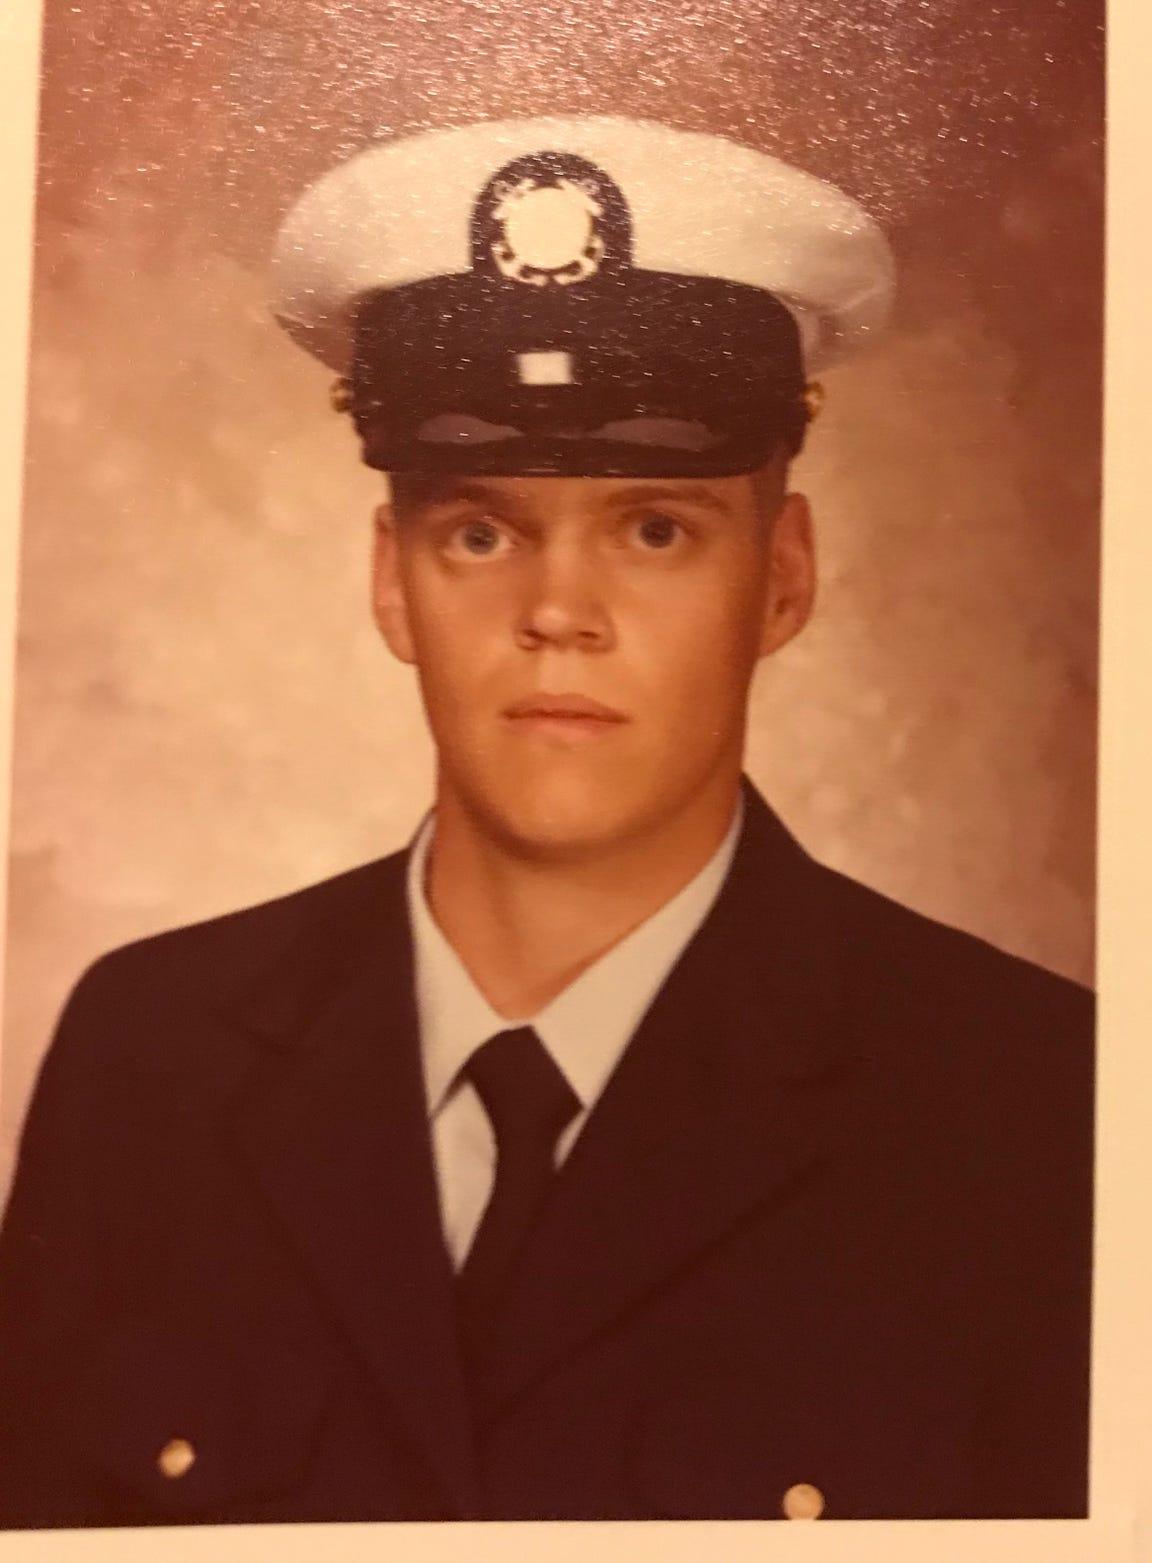 Jeff Abrawmowski in his Coast Guard uniform